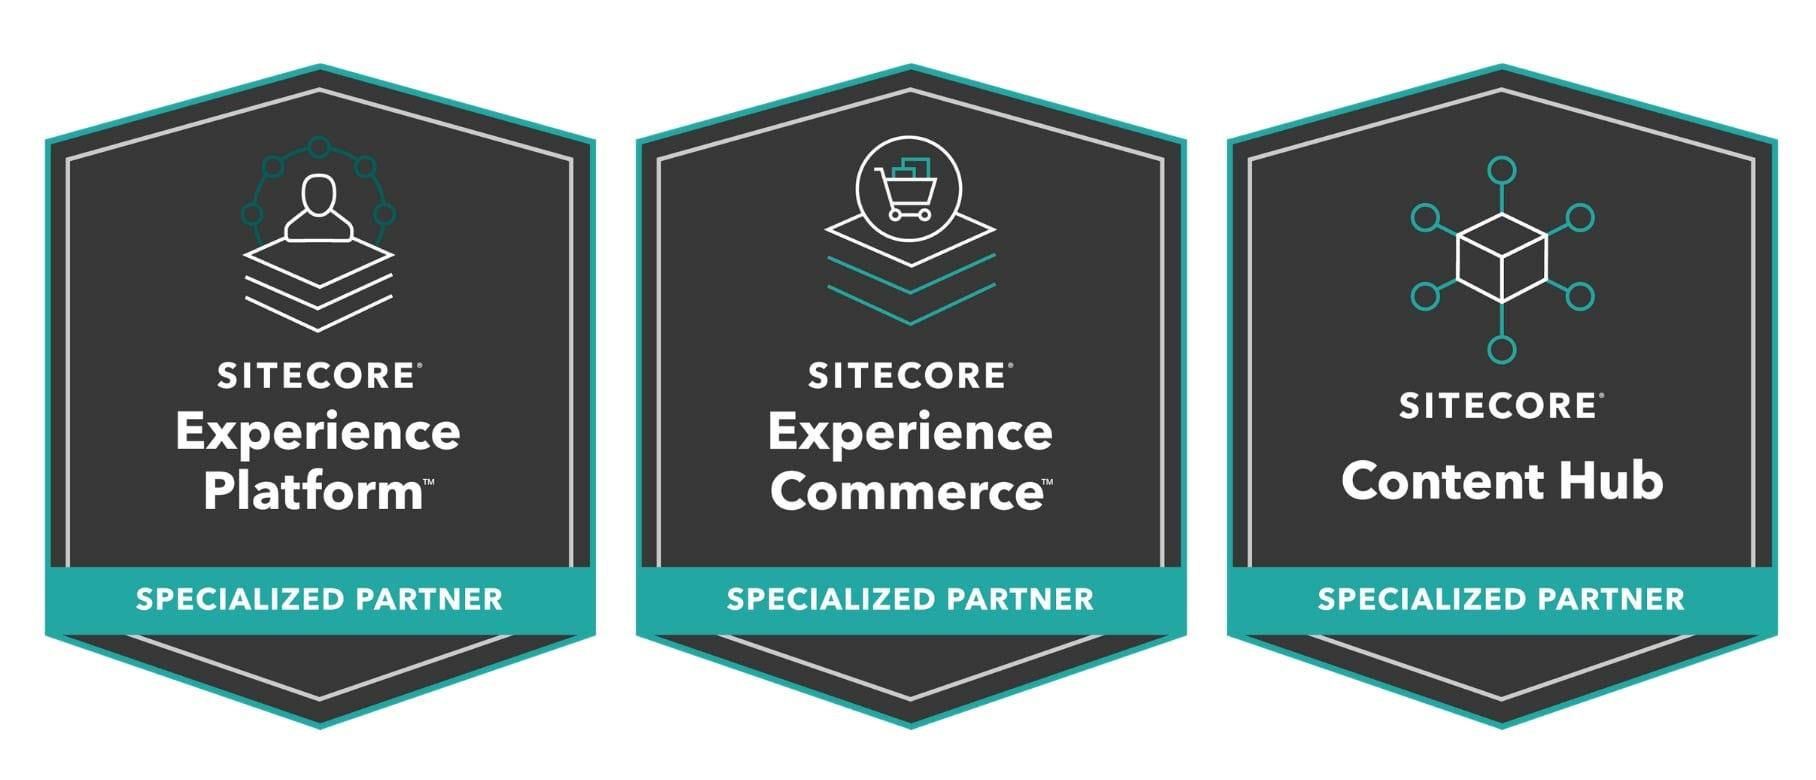 Sitecore Specialized Partner